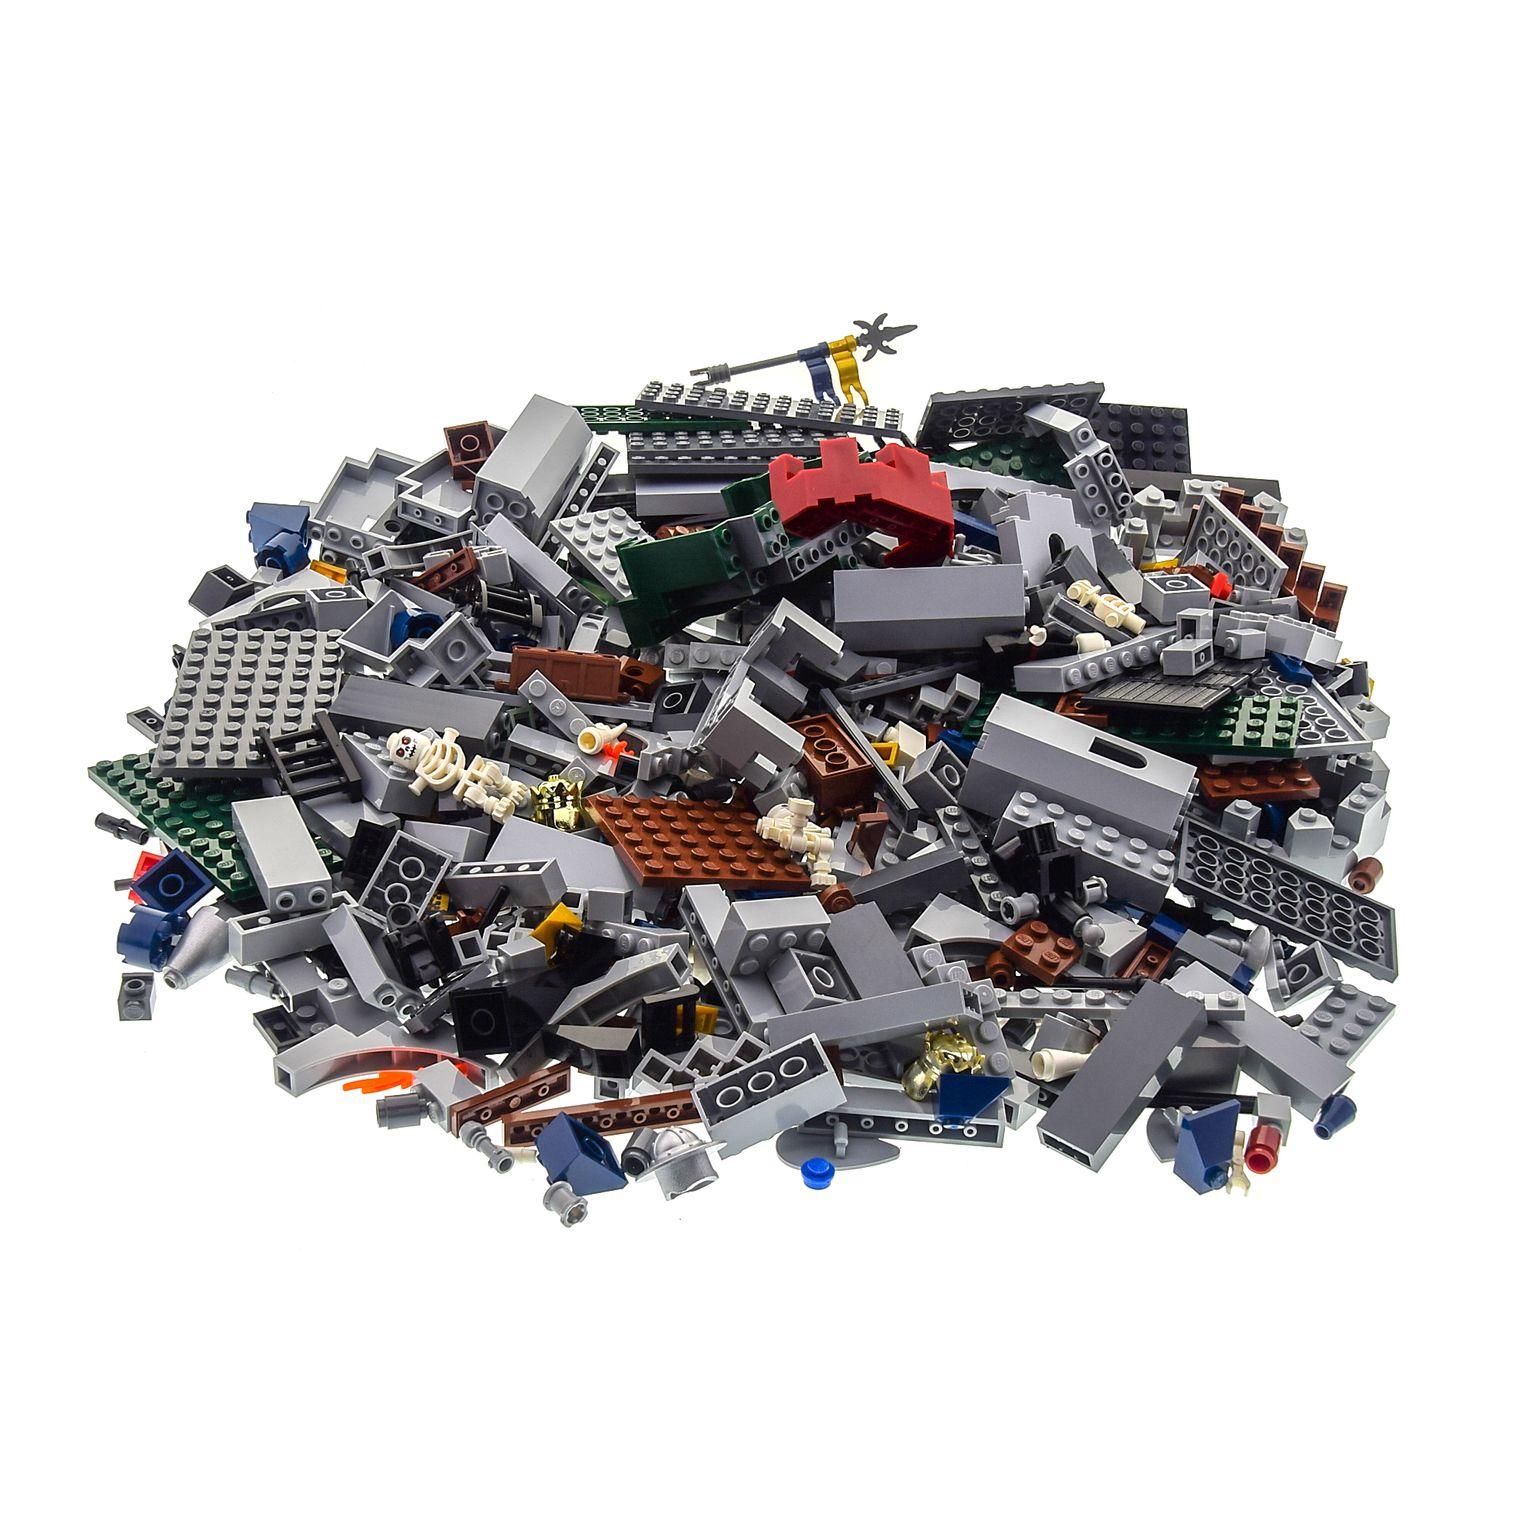 1 X Lego Brick Parts For Set Fantasy Era 7094 Kings Castle Siege